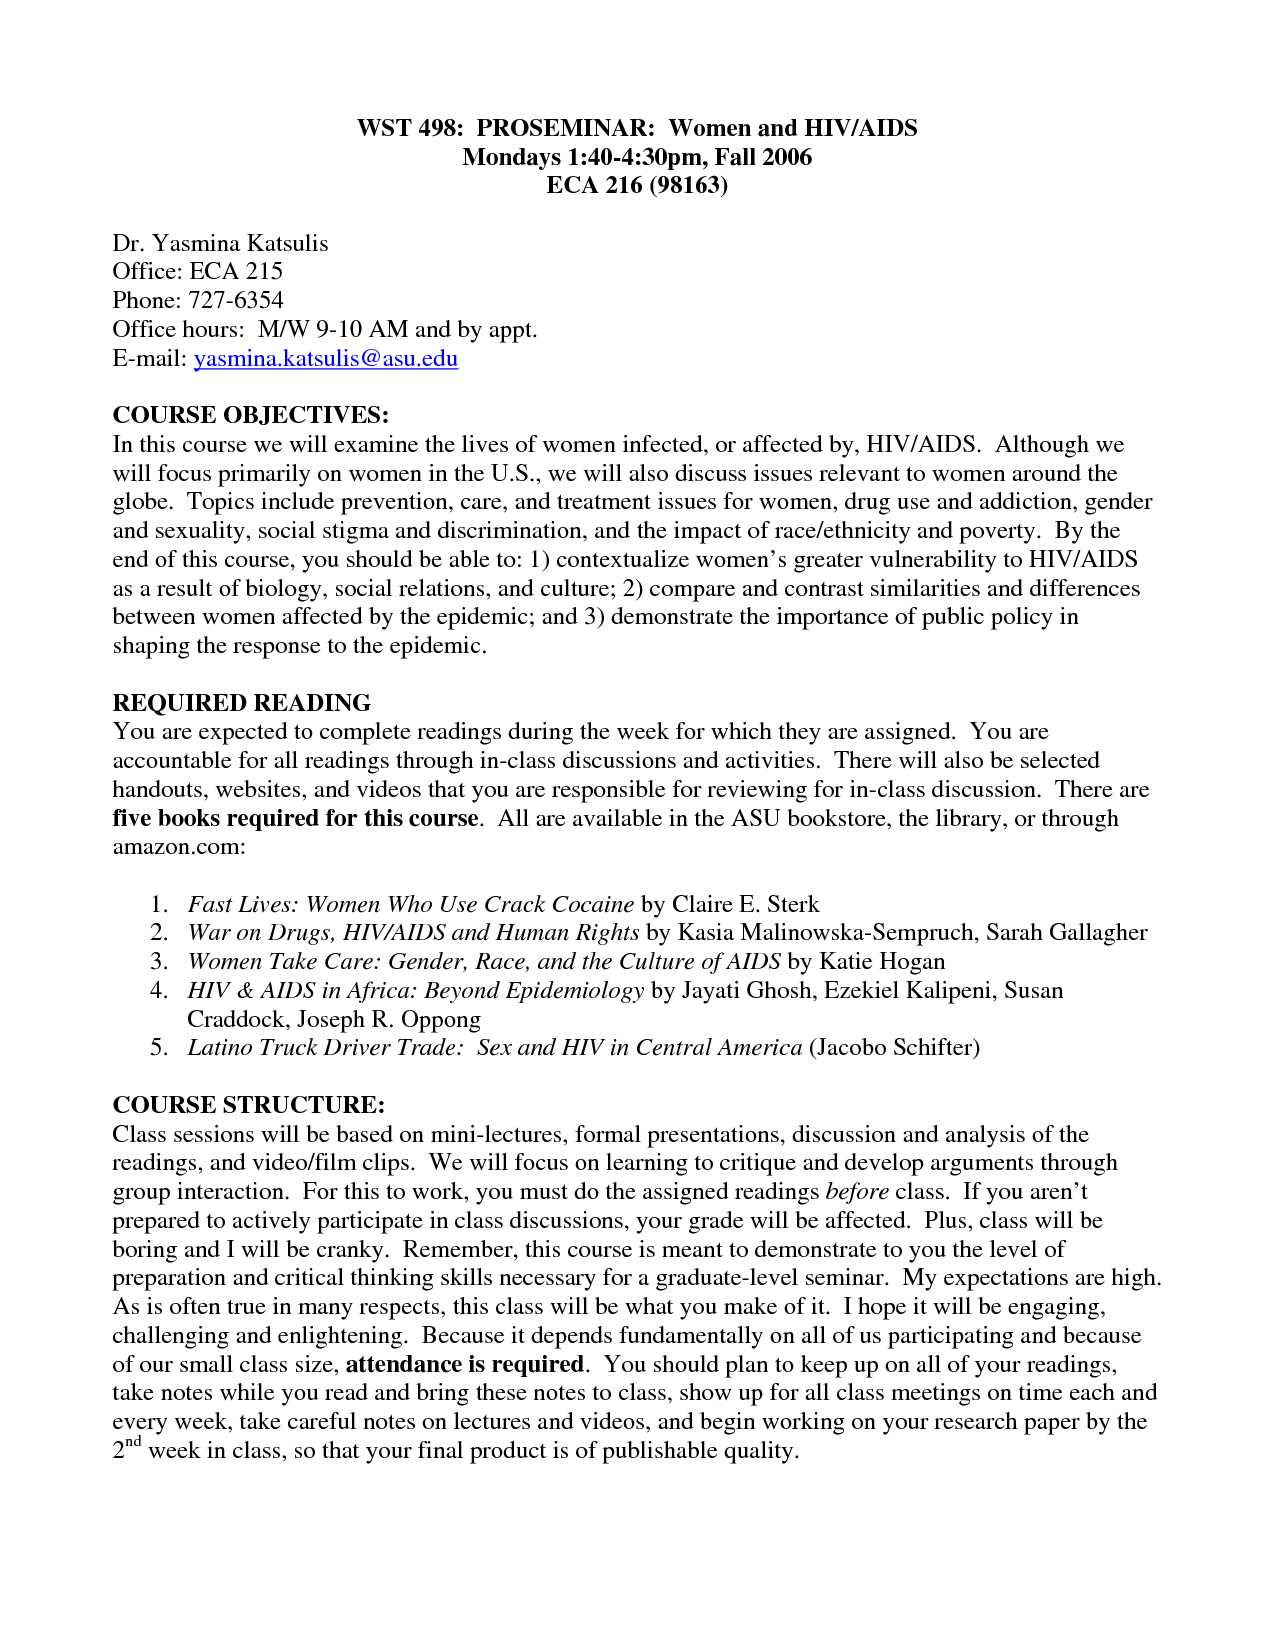 Research Thesi Proposal Template Paper Busines Epidemiology Essay Question Idea